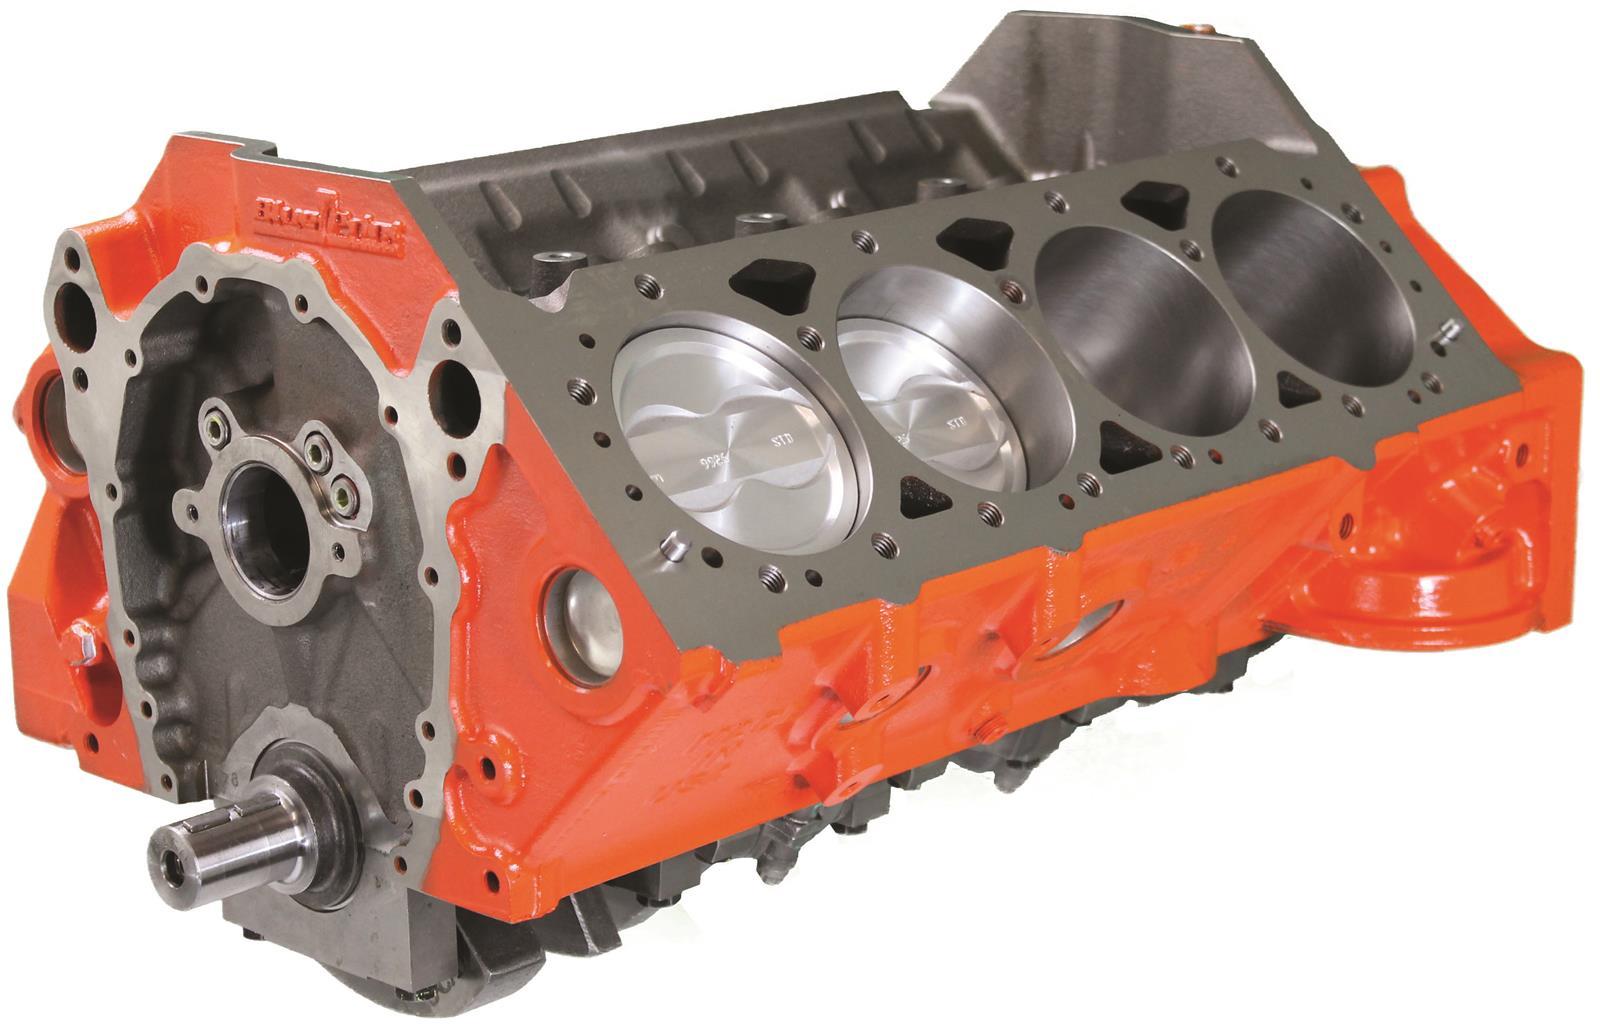 Blueprint Engines Gm 383 C I D Stroker Short Block Engines Bp38320